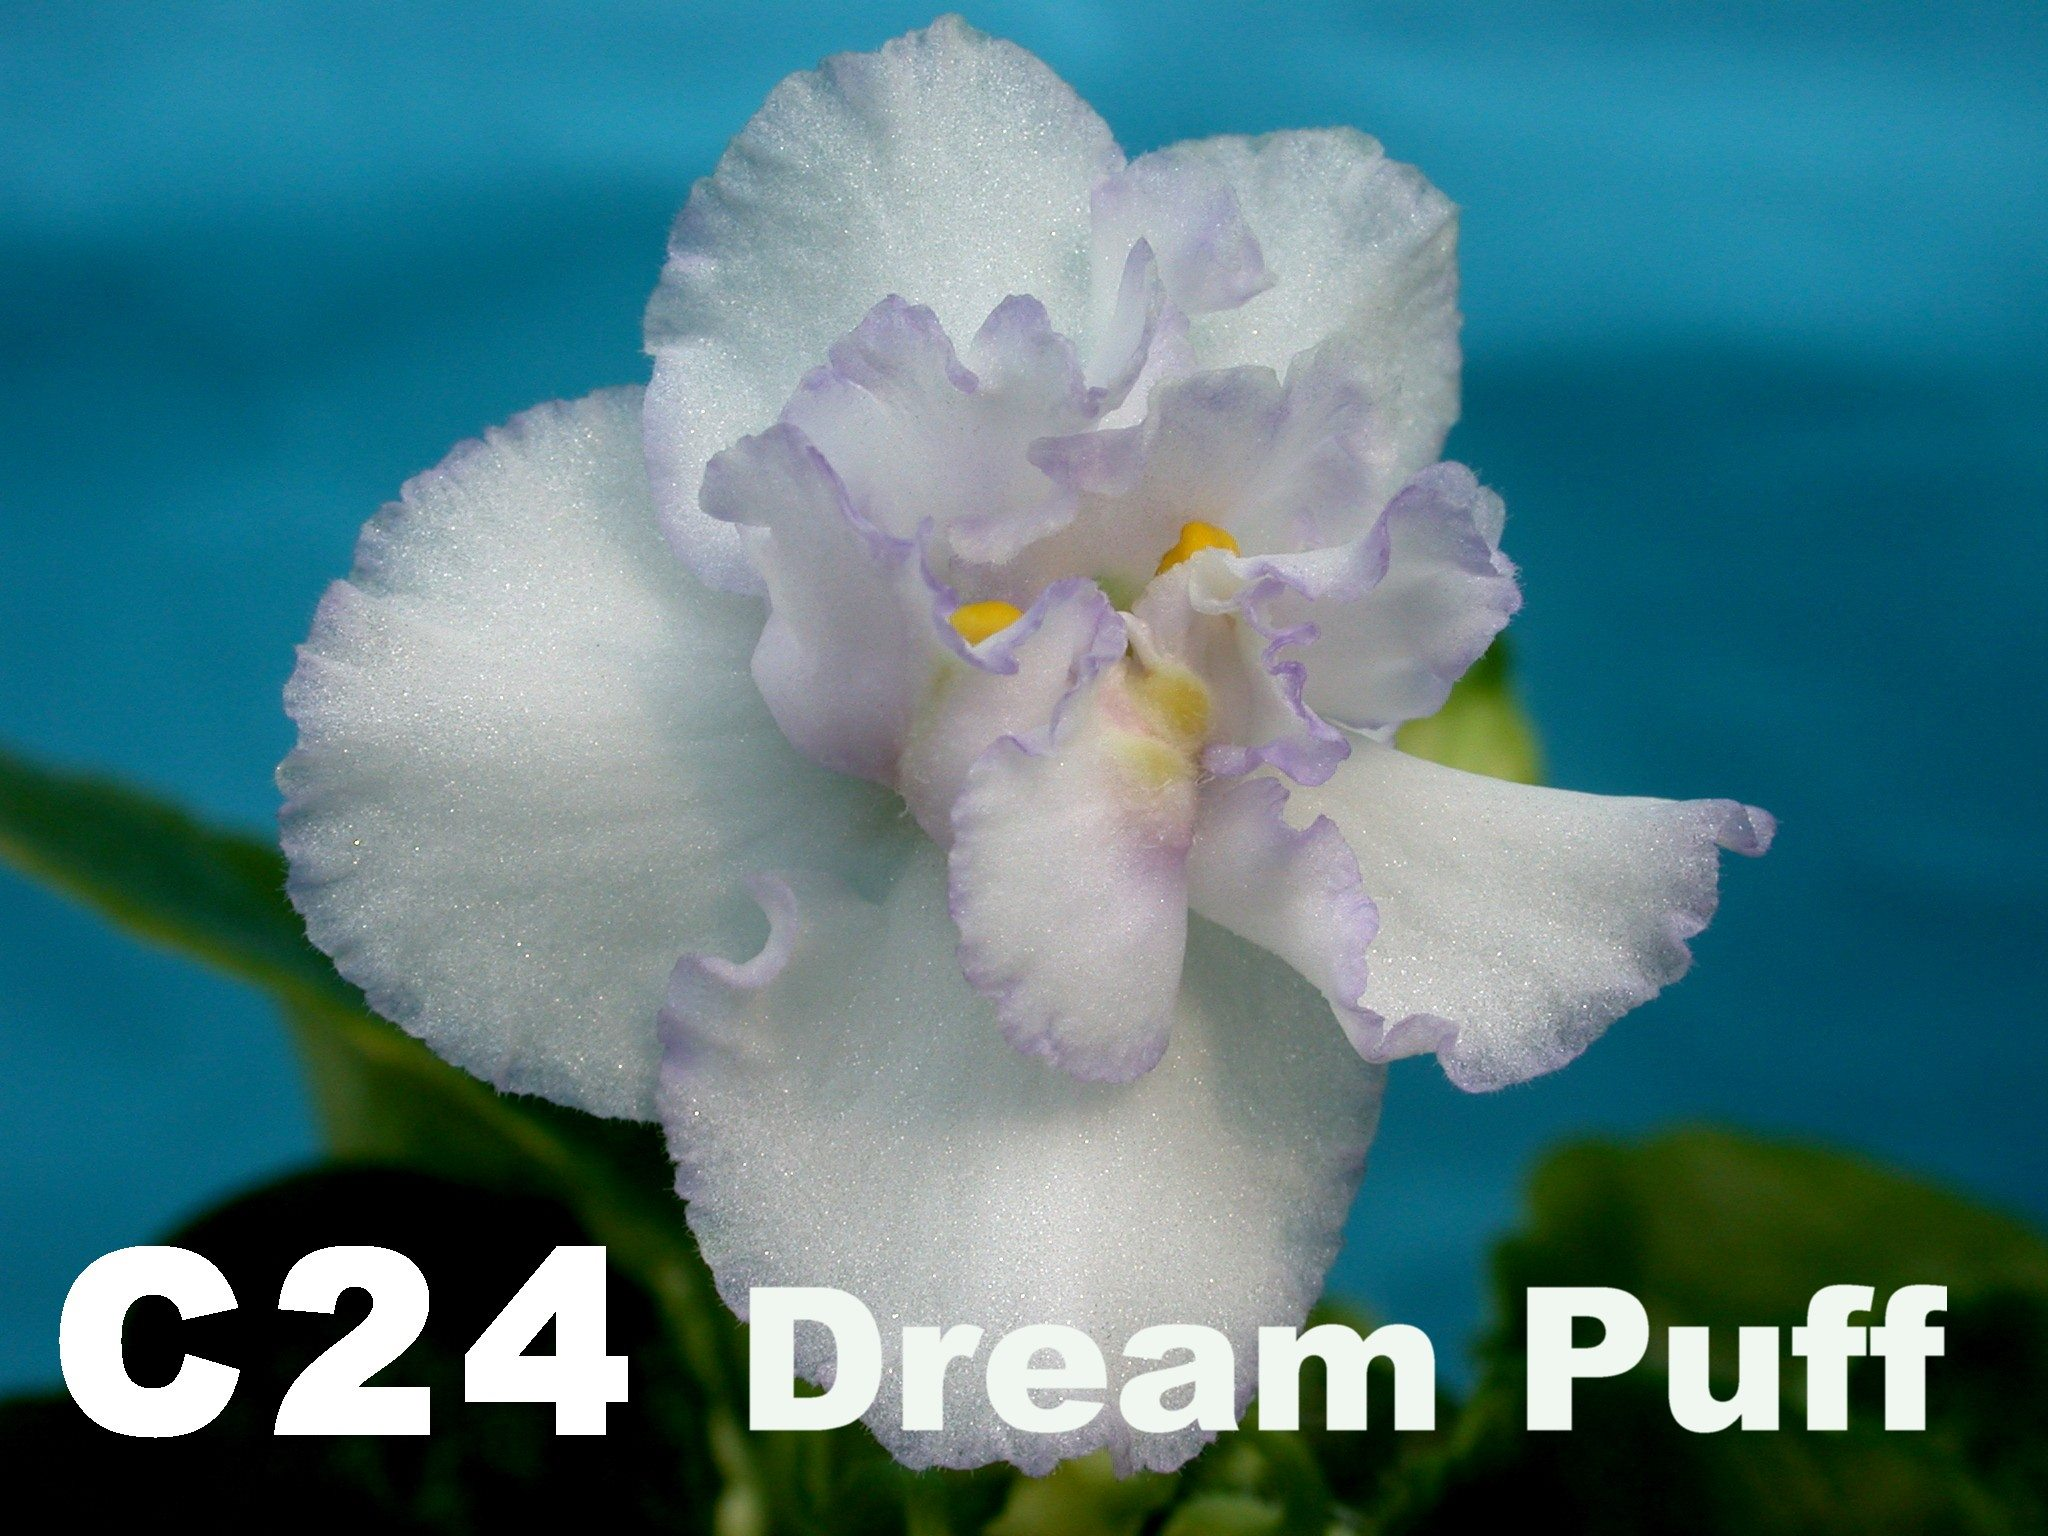 非洲紫羅蘭名錄 | African Violets Catalogue - C系列 C24